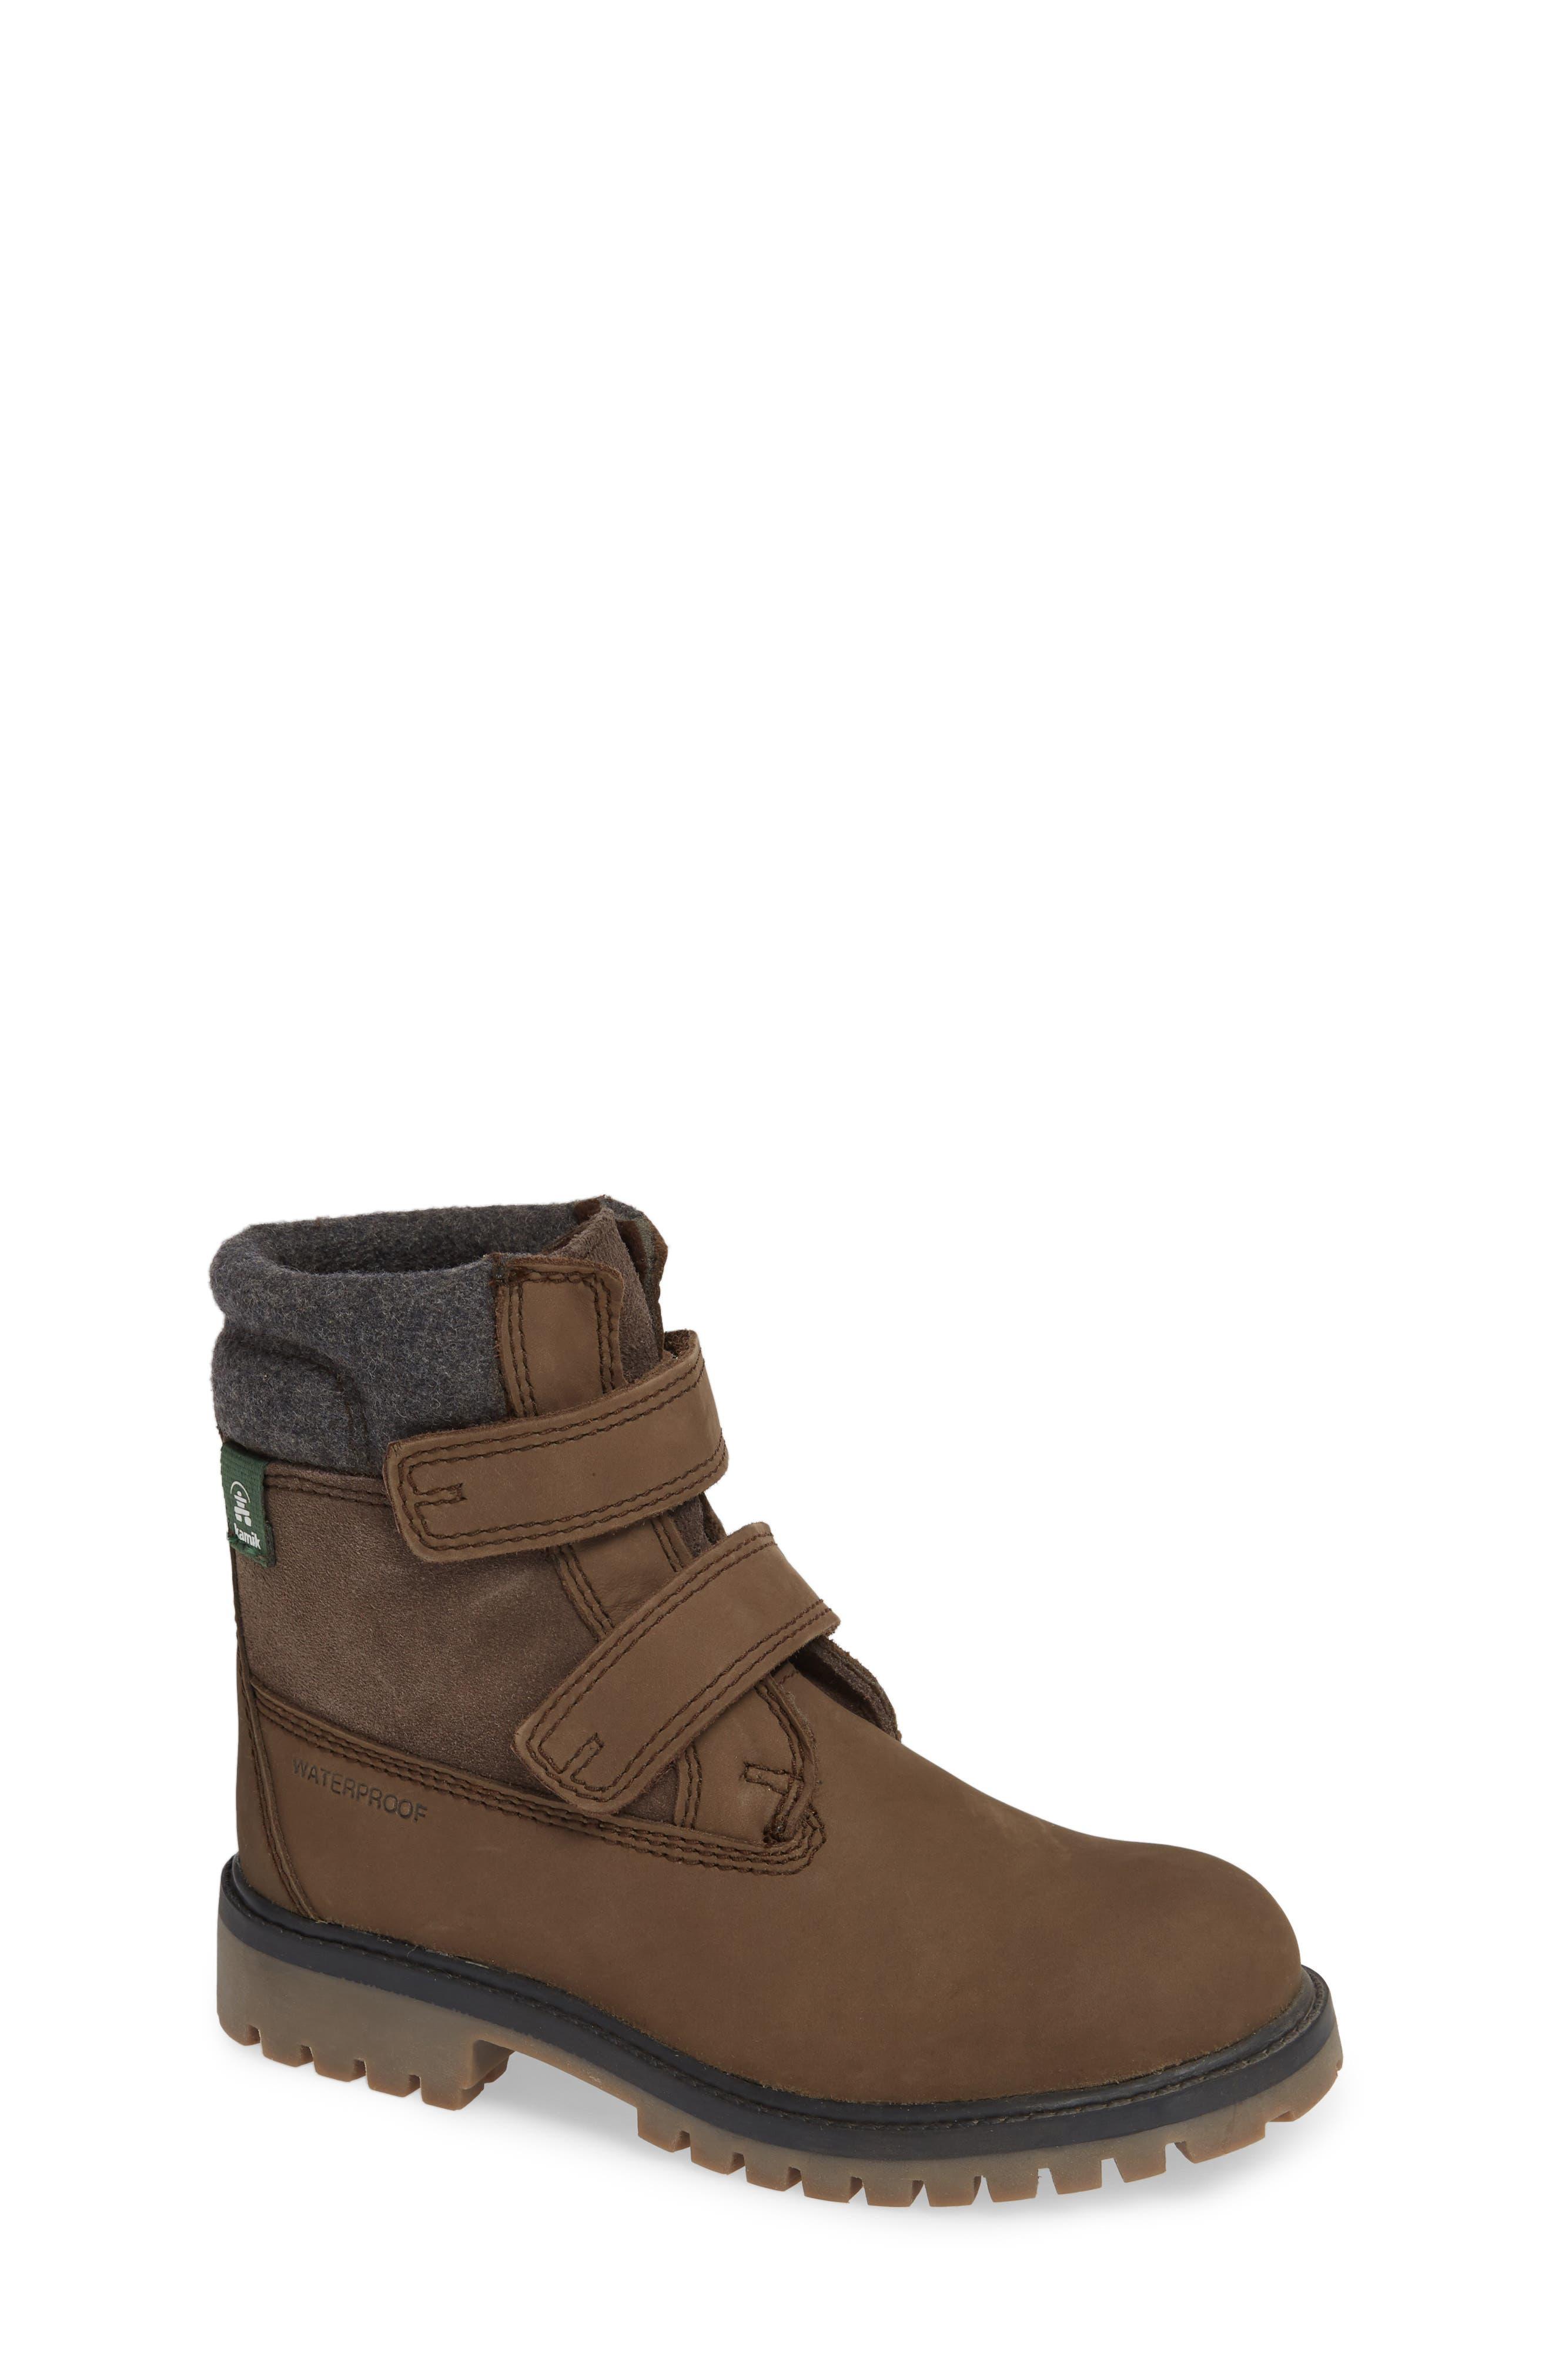 Takodav Waterproof Boot,                             Main thumbnail 1, color,                             200